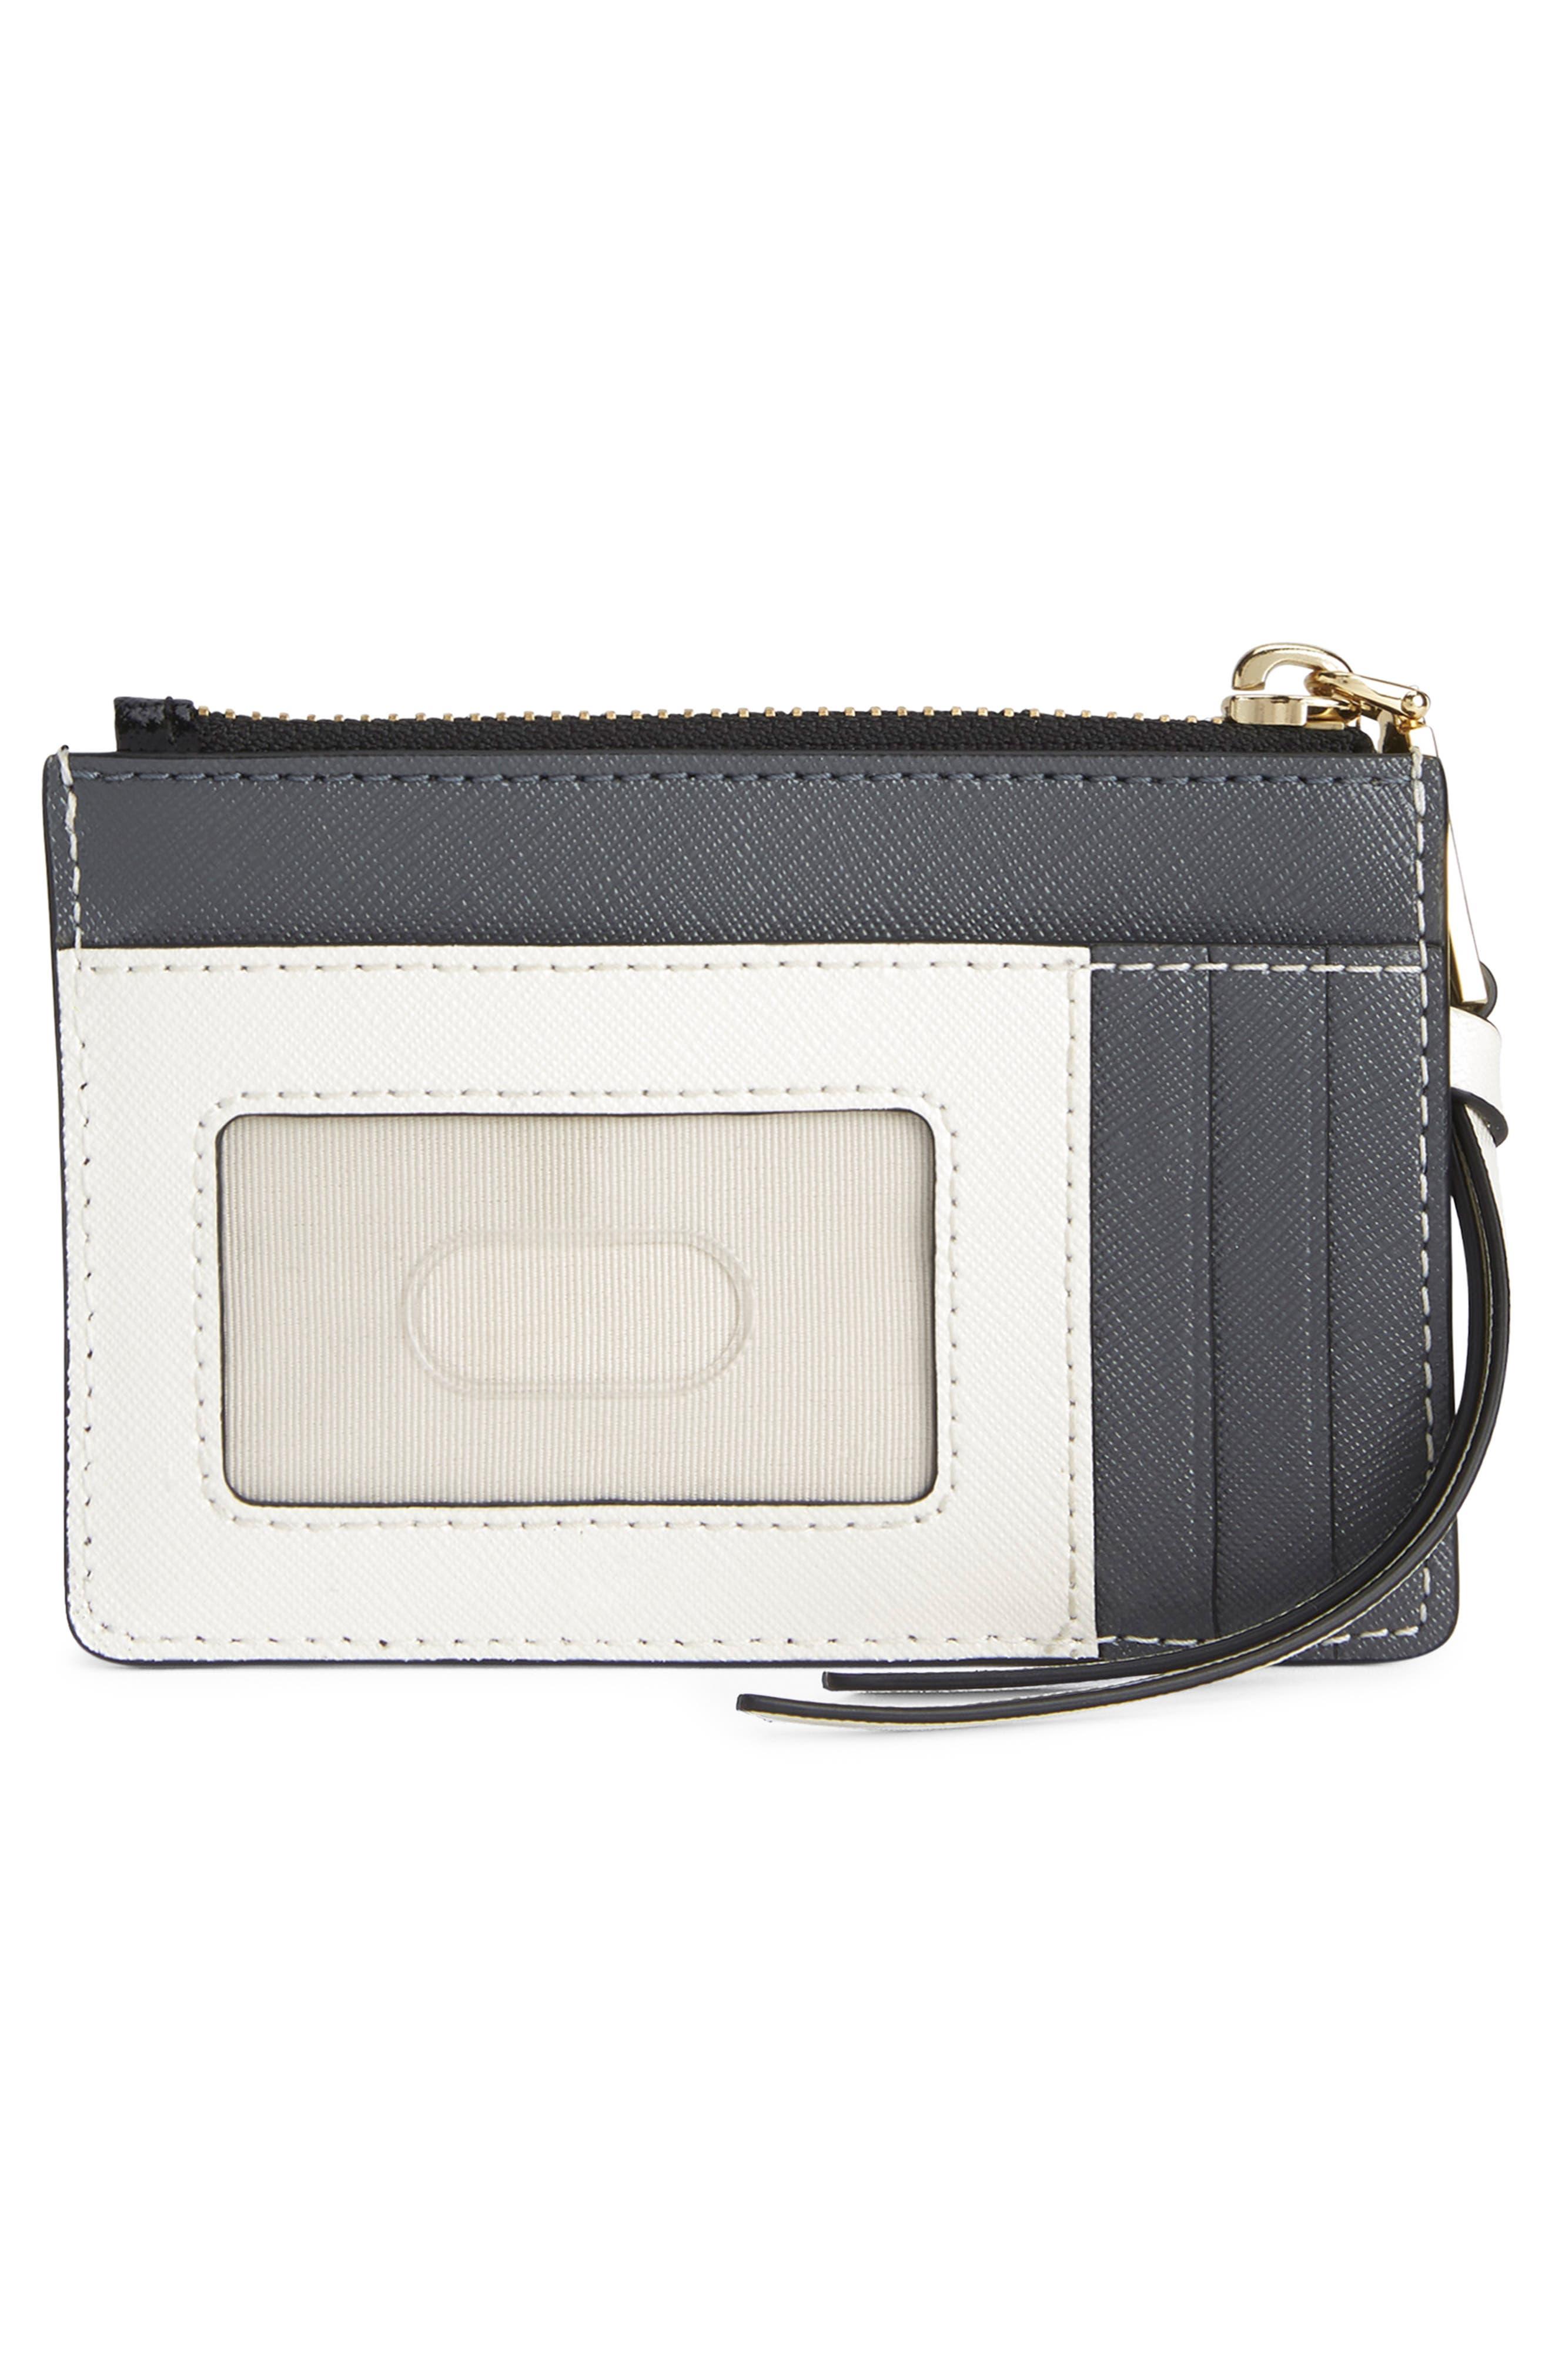 Snapshot Small Leather Wallet,                             Alternate thumbnail 4, color,                             BLACK MULTI